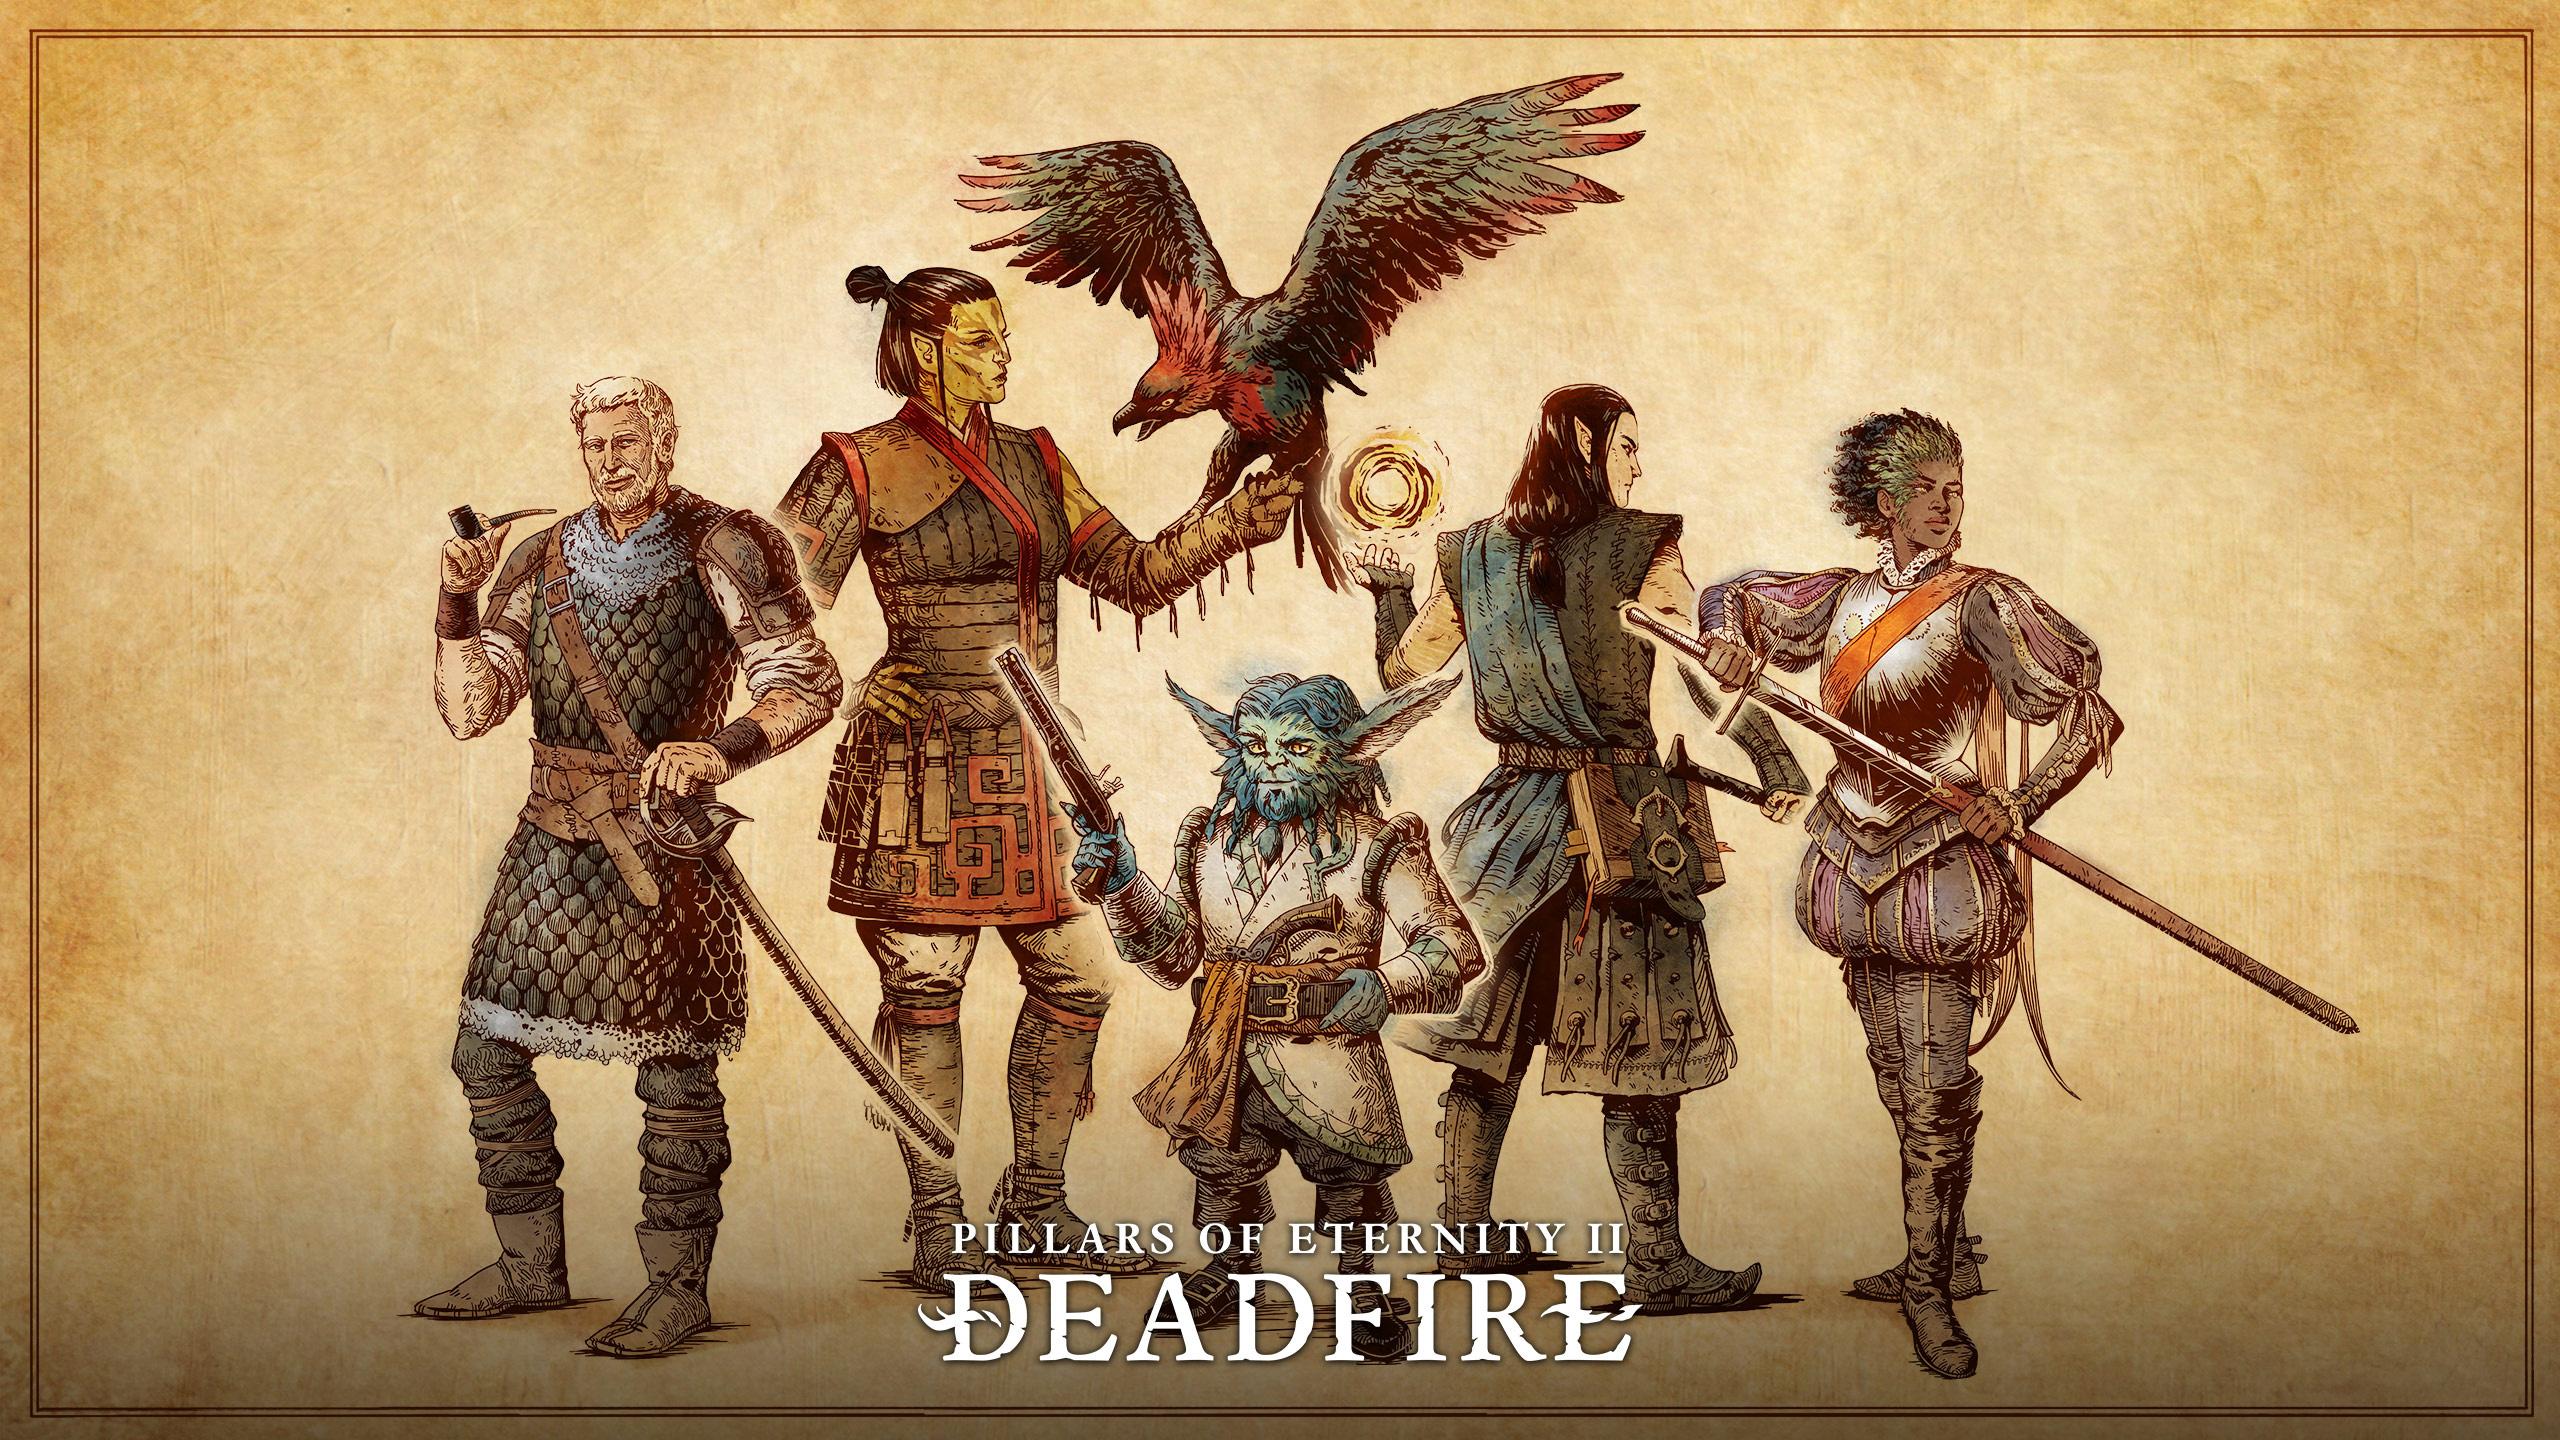 Сопартийцы - Pillars of Eternity 2: Deadfire арт, Расы, спутники